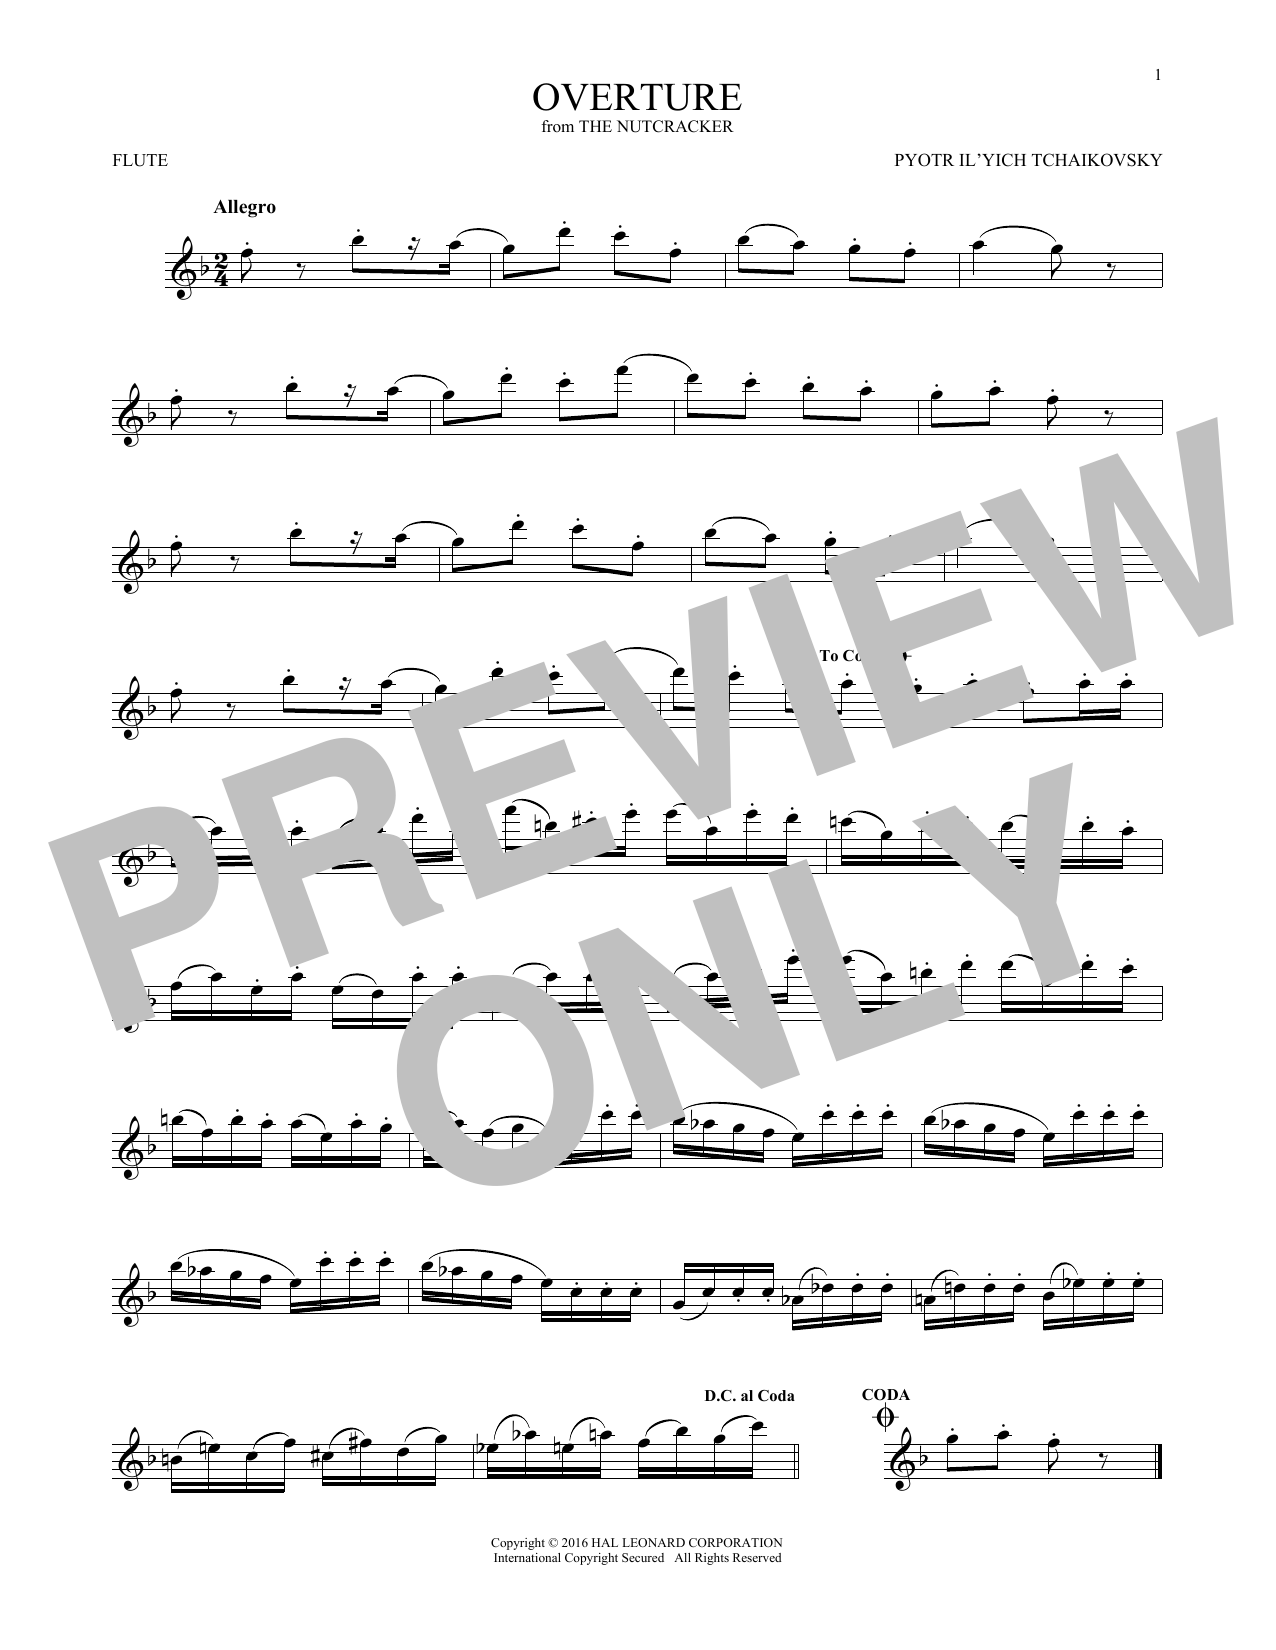 Overture (Flute Solo)